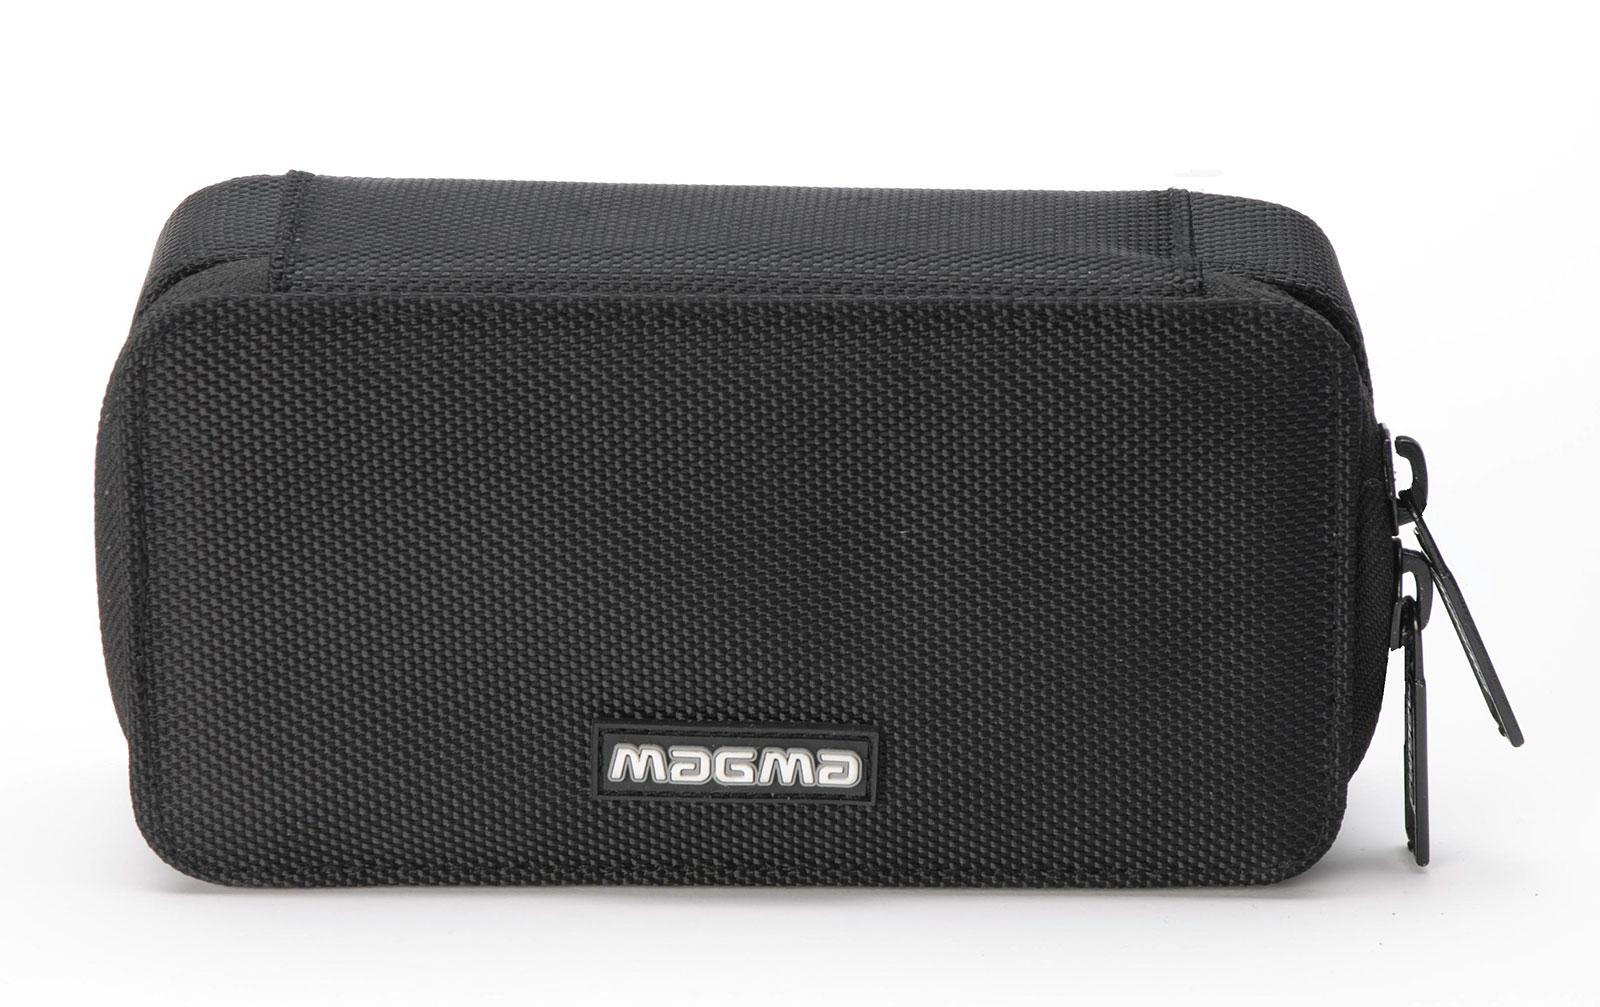 magma-headshell-case-black-41250-